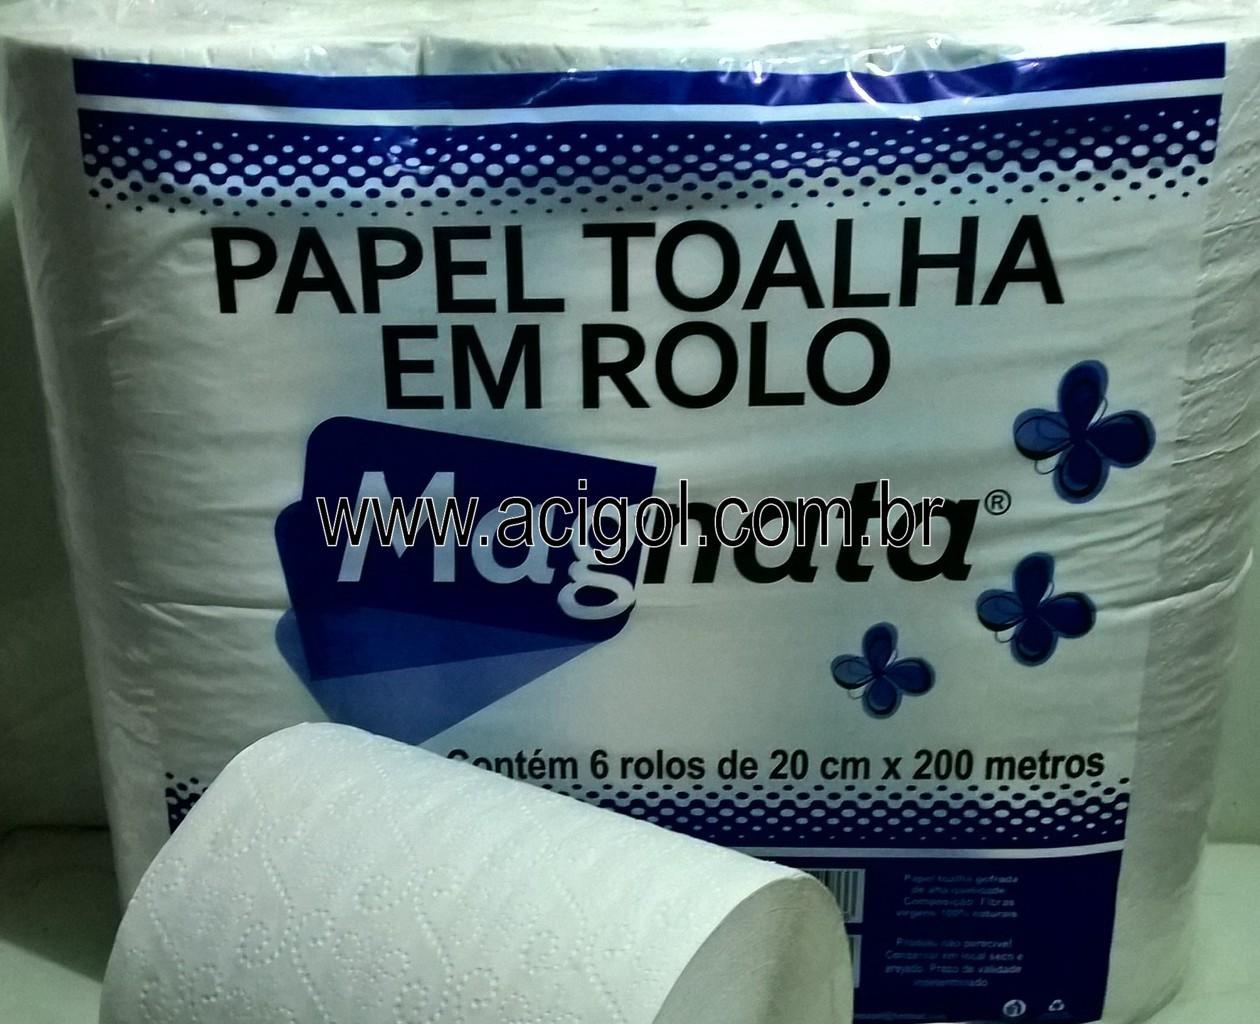 PAPEL TOALHA BOBONA MAGNATA 6X200M-WP_20161210_20_13_31_Raw_LI